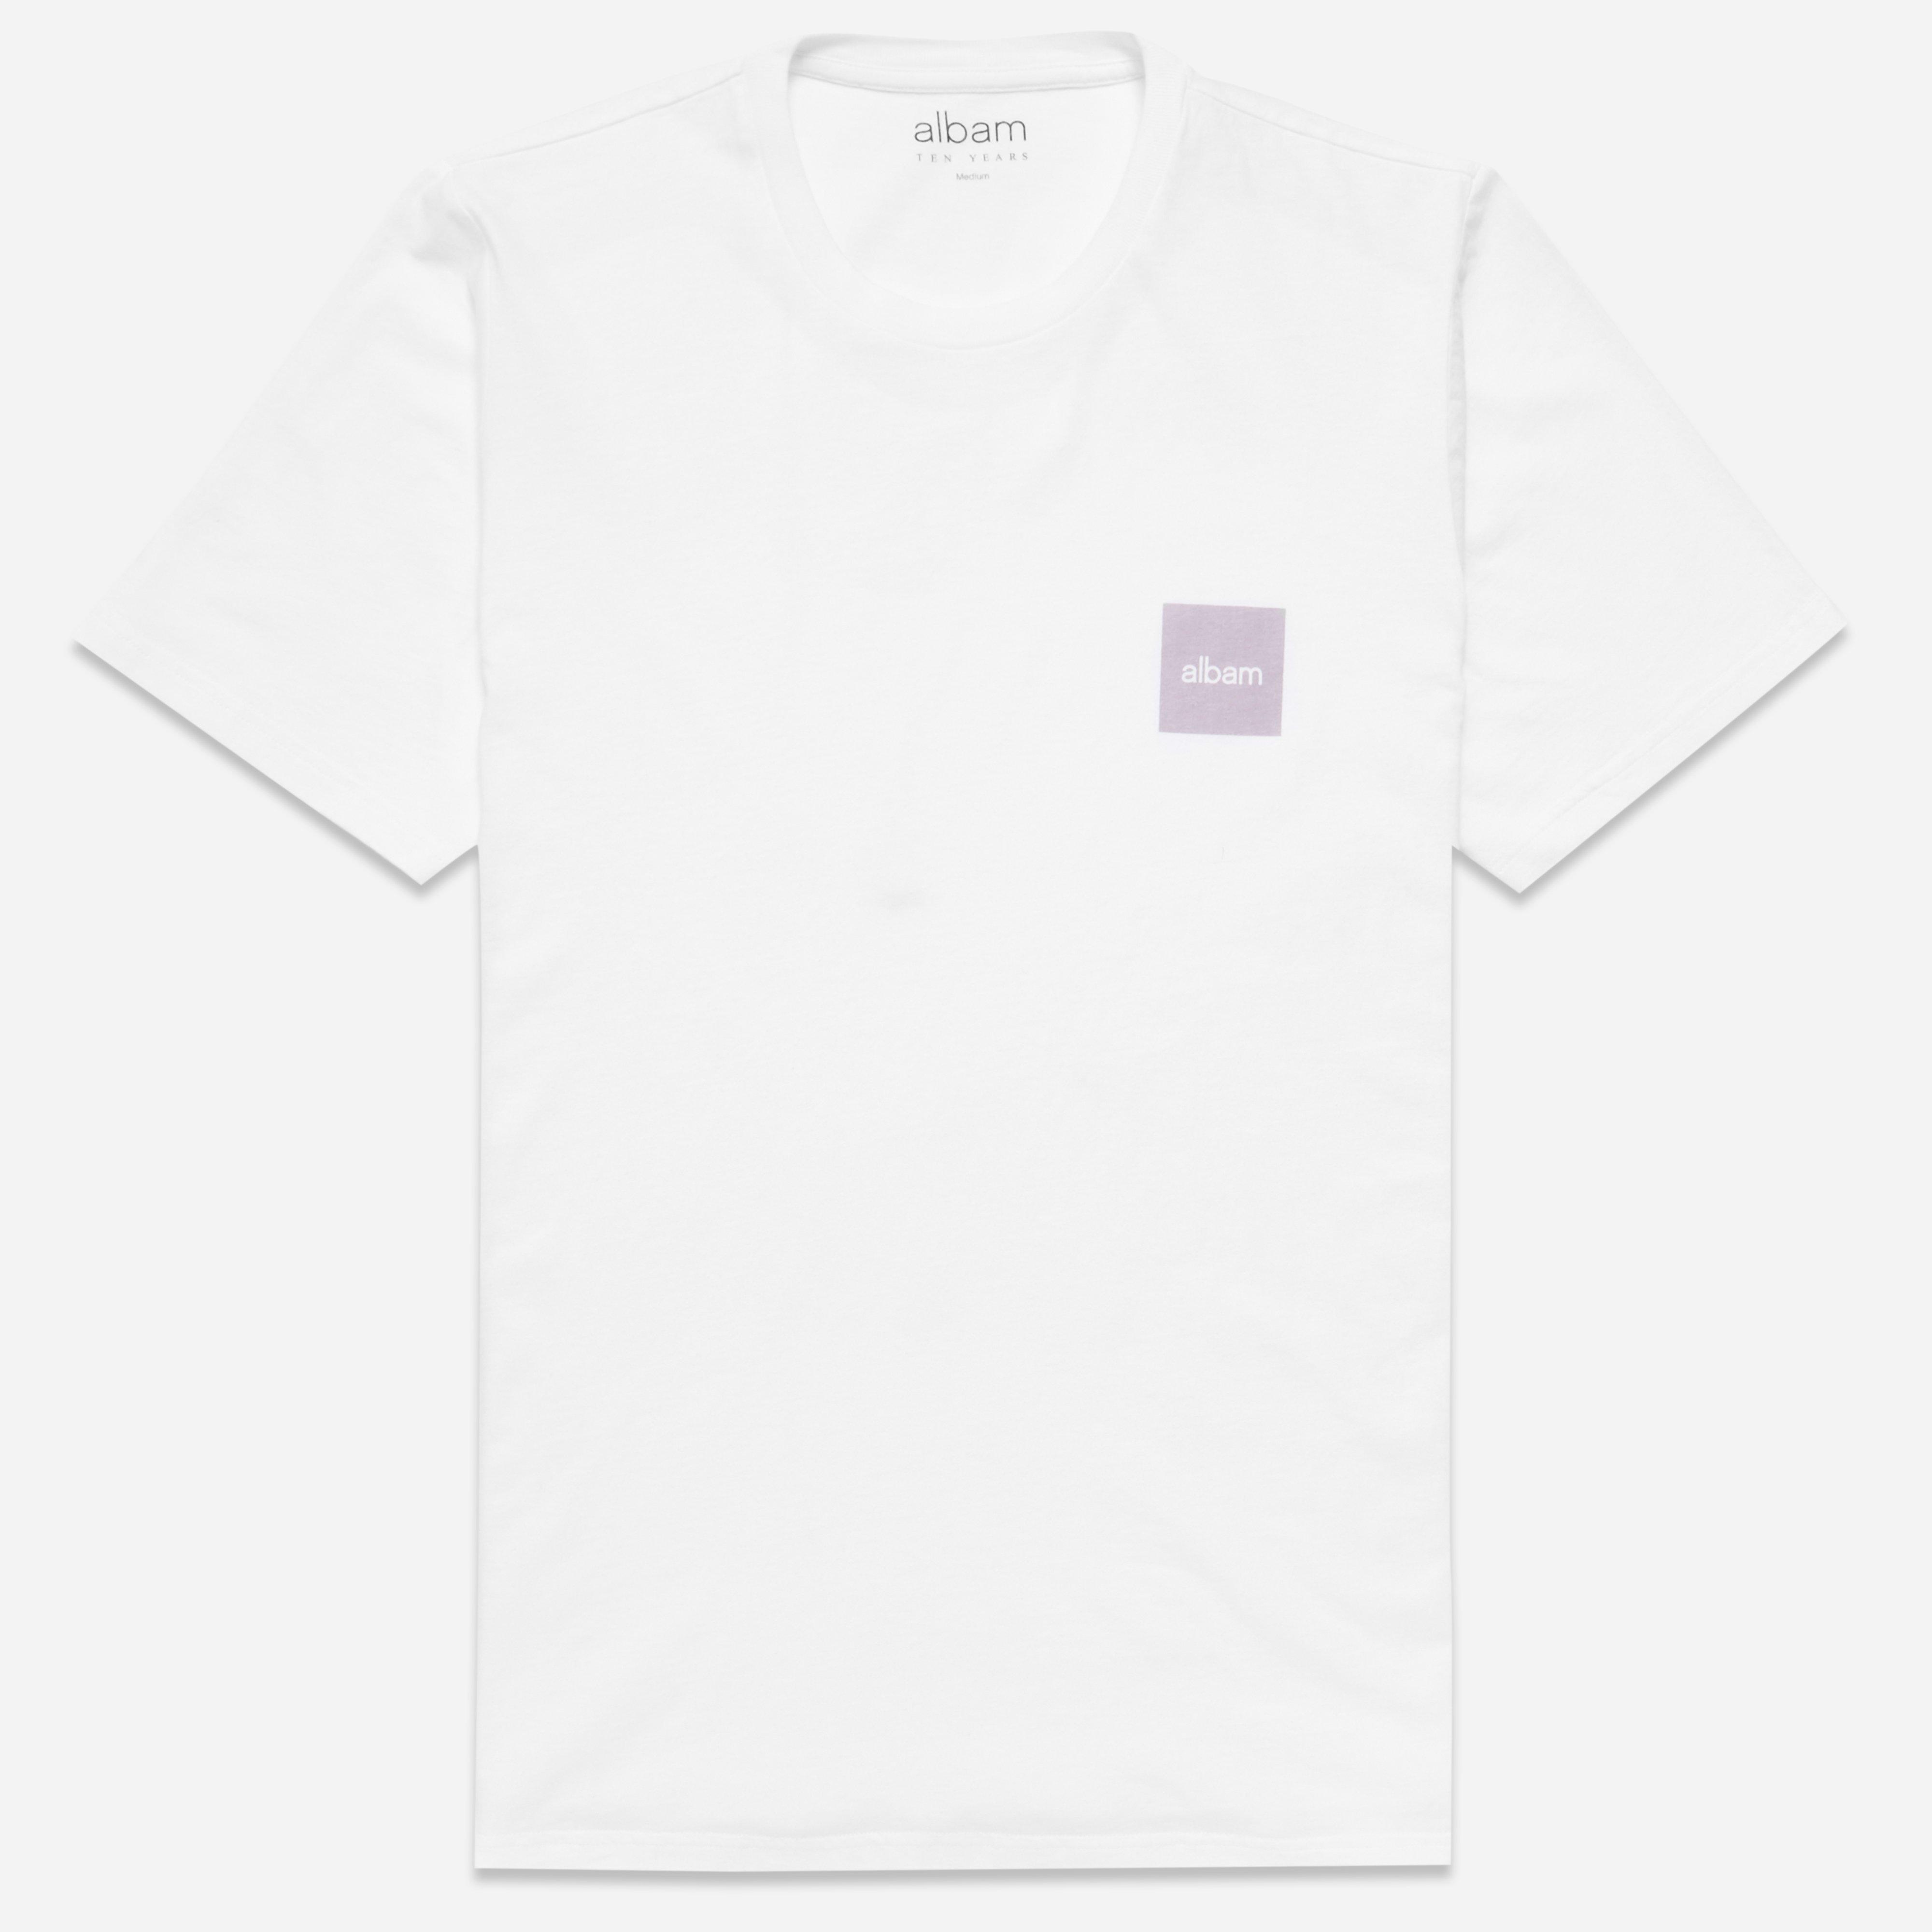 Albam decade T-shirt